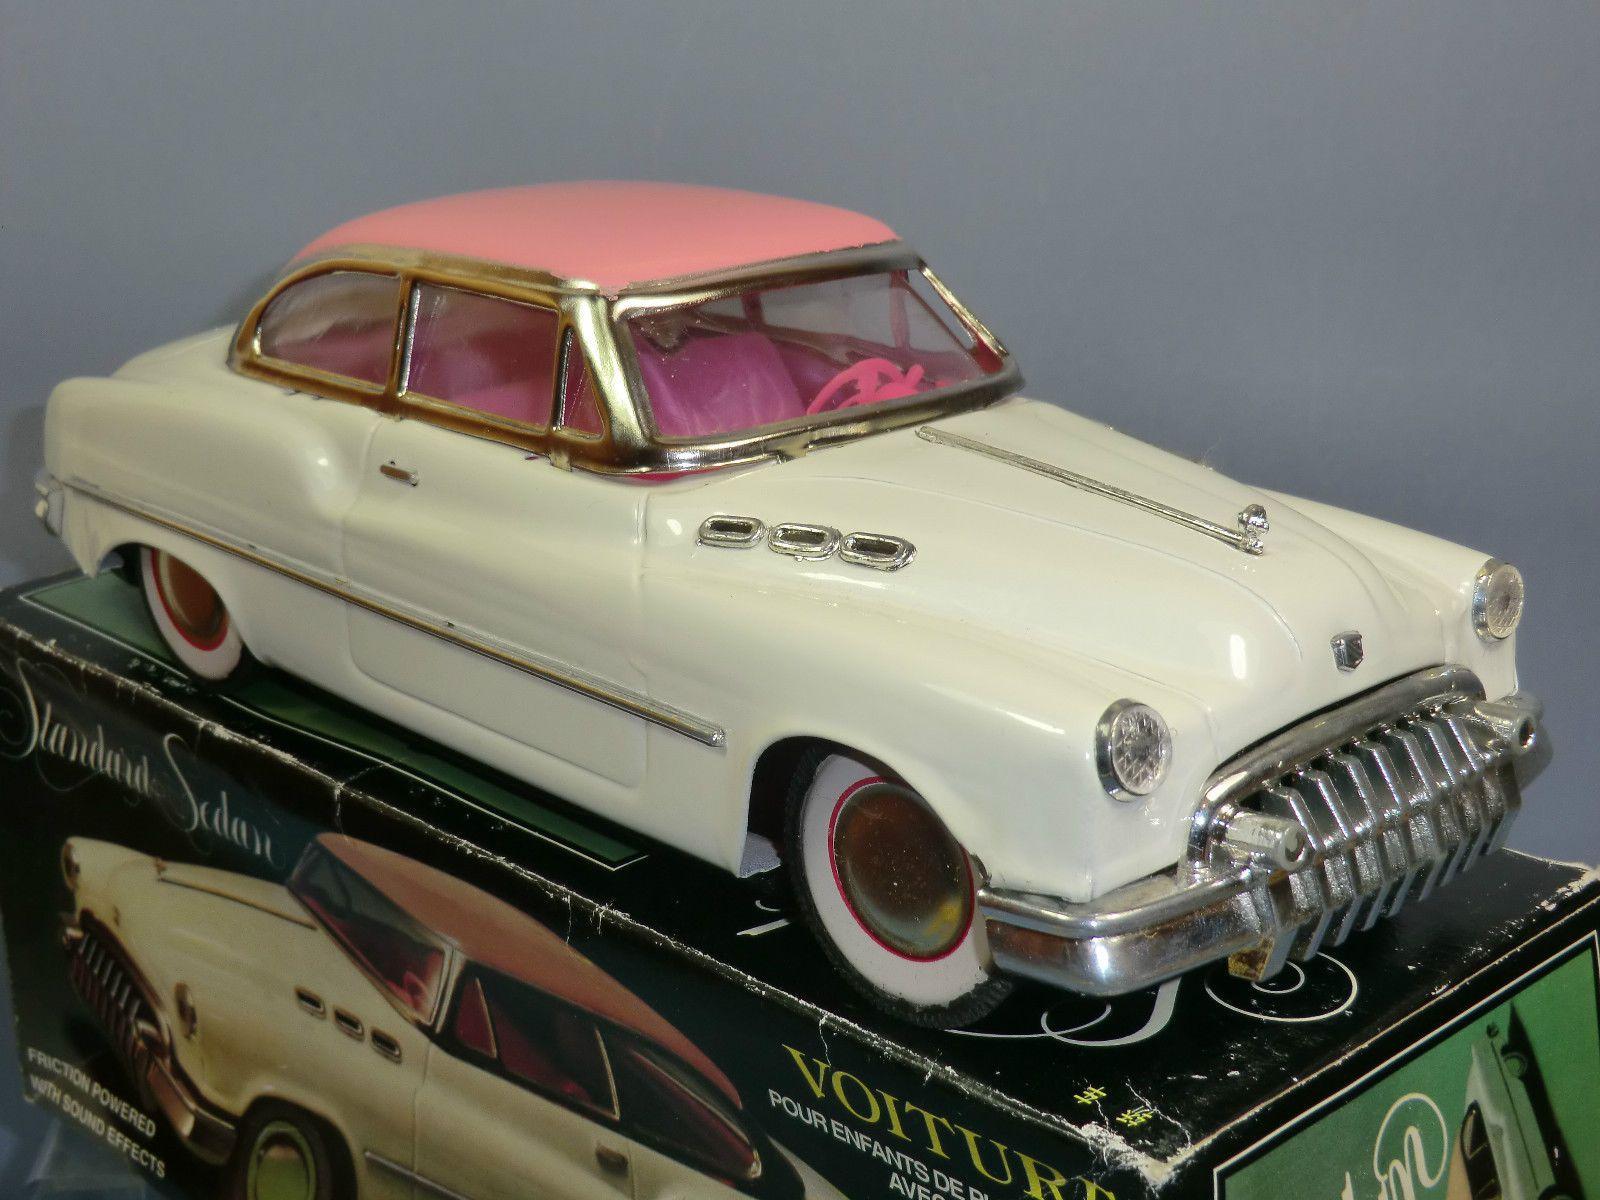 1950 toys images  TINPLATE  FRICTION VOITURE NoMF uS CADILAC  DOOR SEDAN MIB